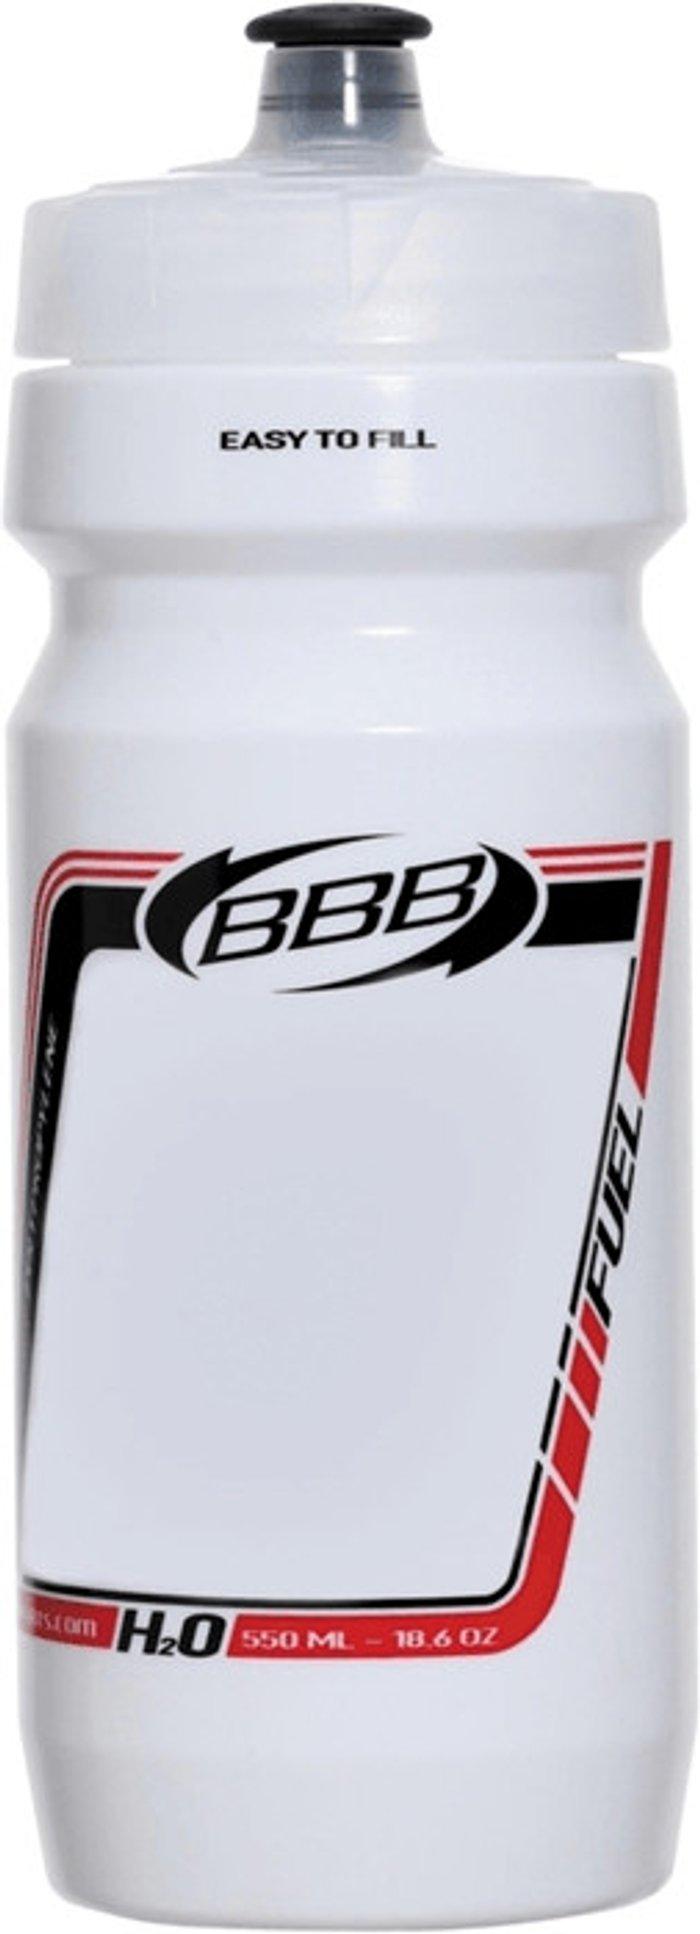 BBB BBB Comptank